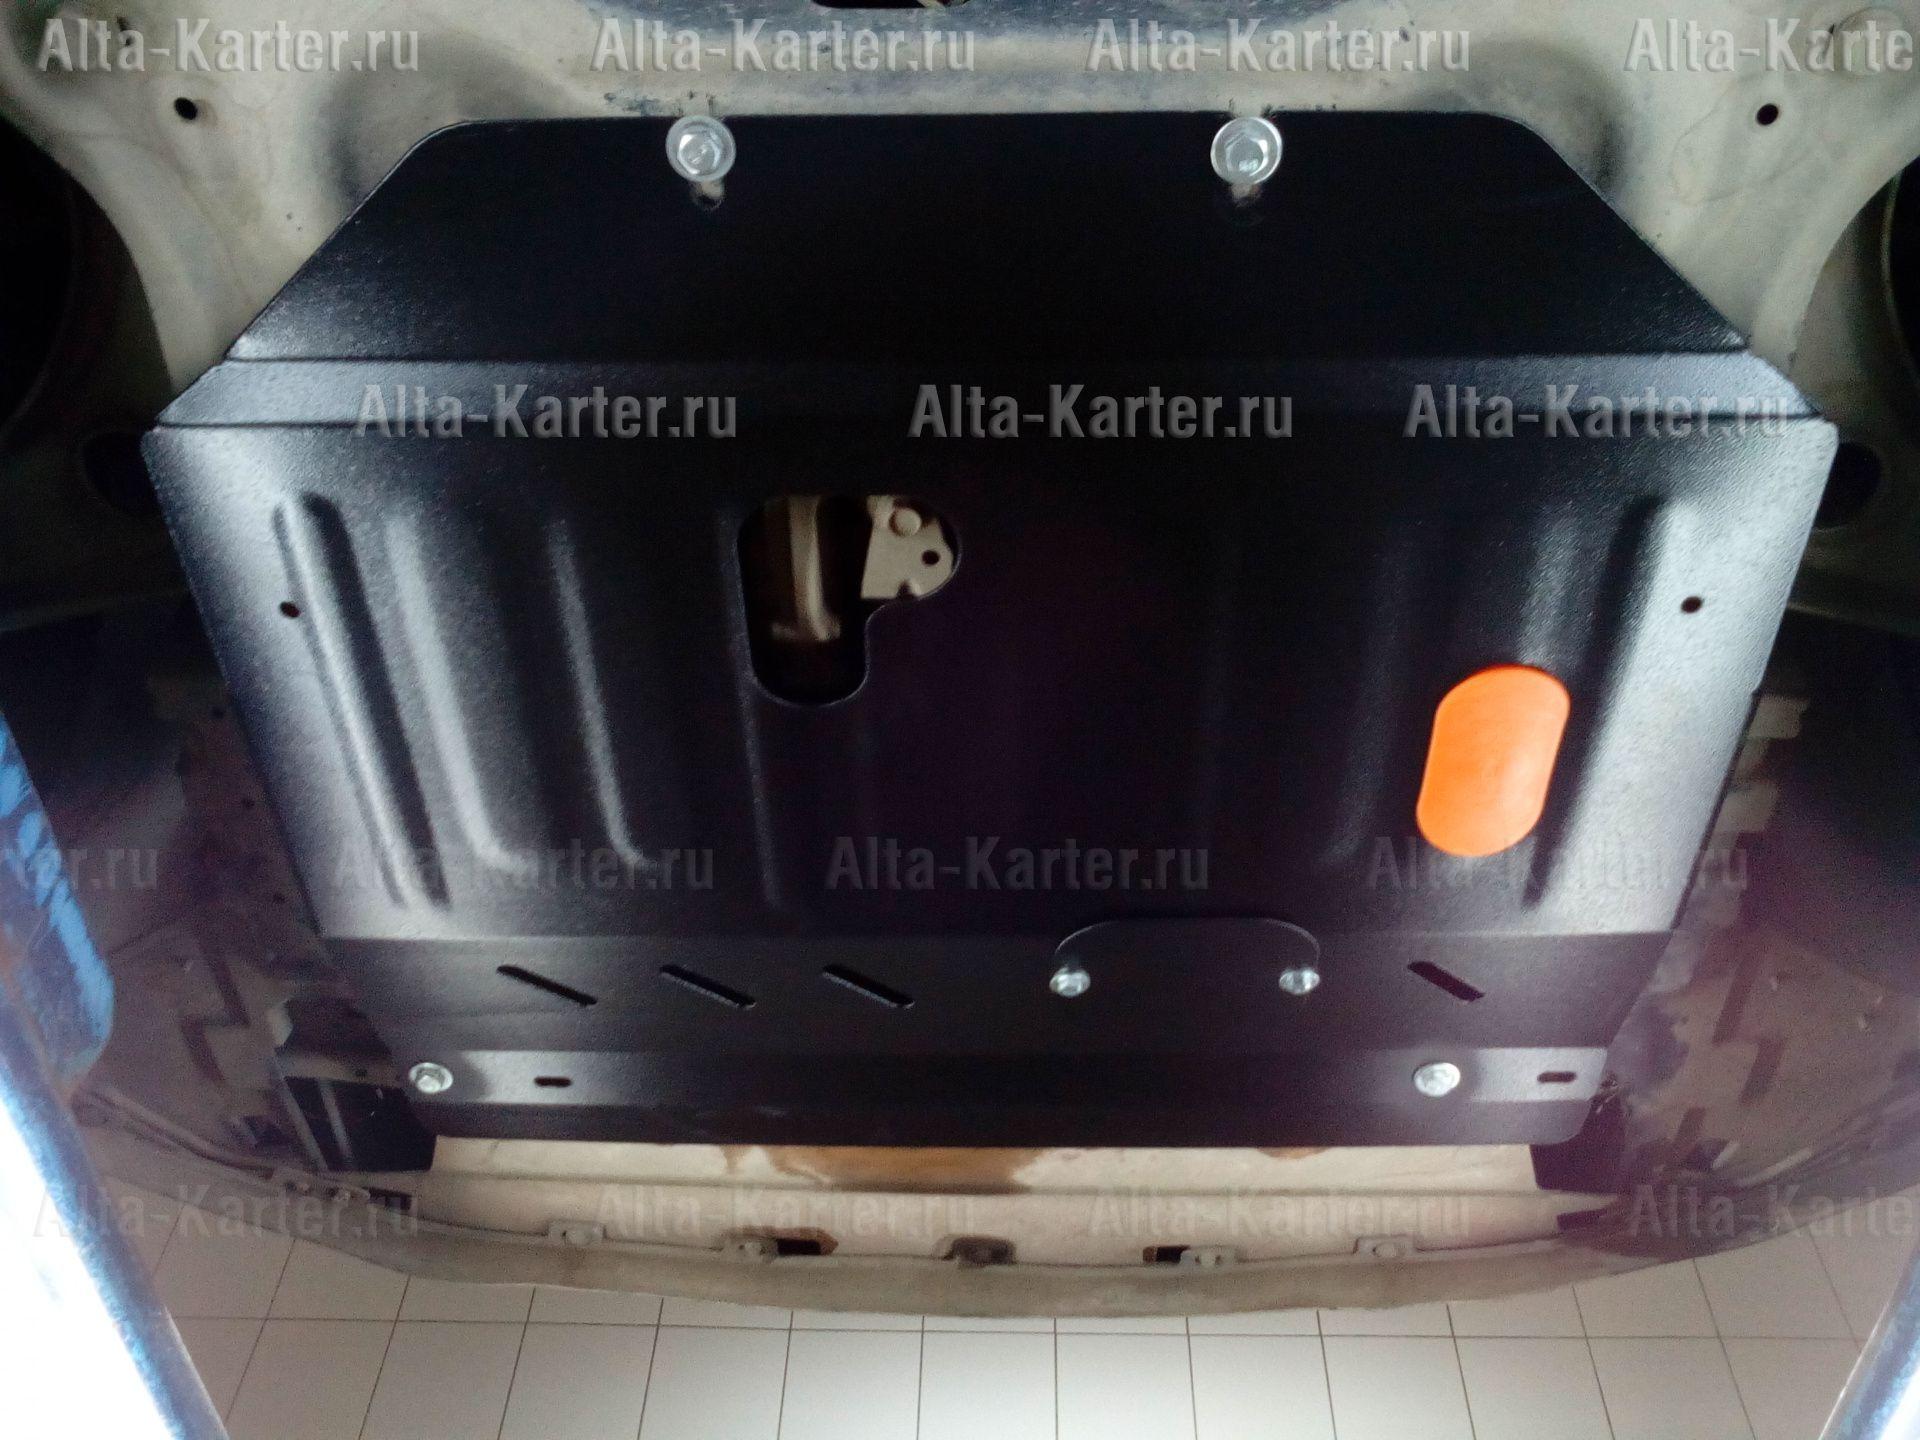 Защита Alfeco для картера и КПП Nissan March K13 2010-2016. Артикул ALF.15.56